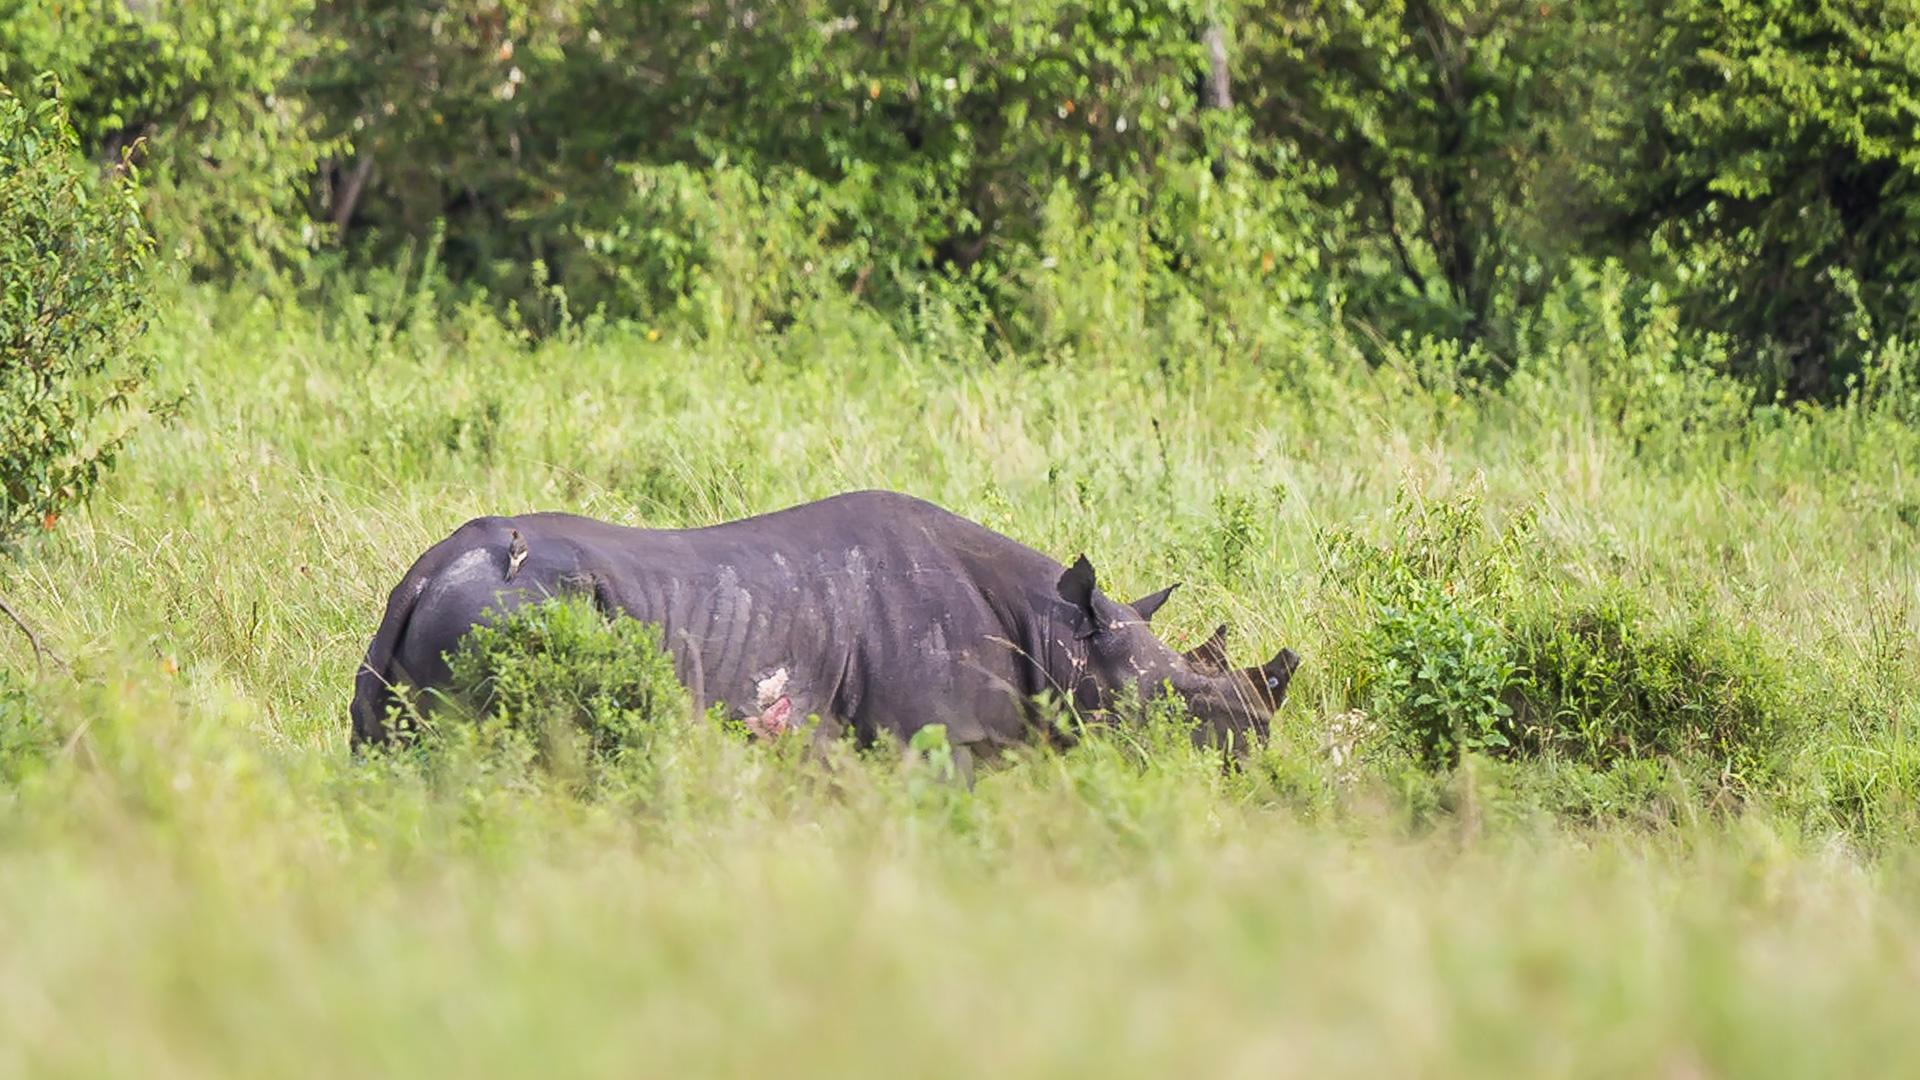 Nosorożec czarny. Masai Mara